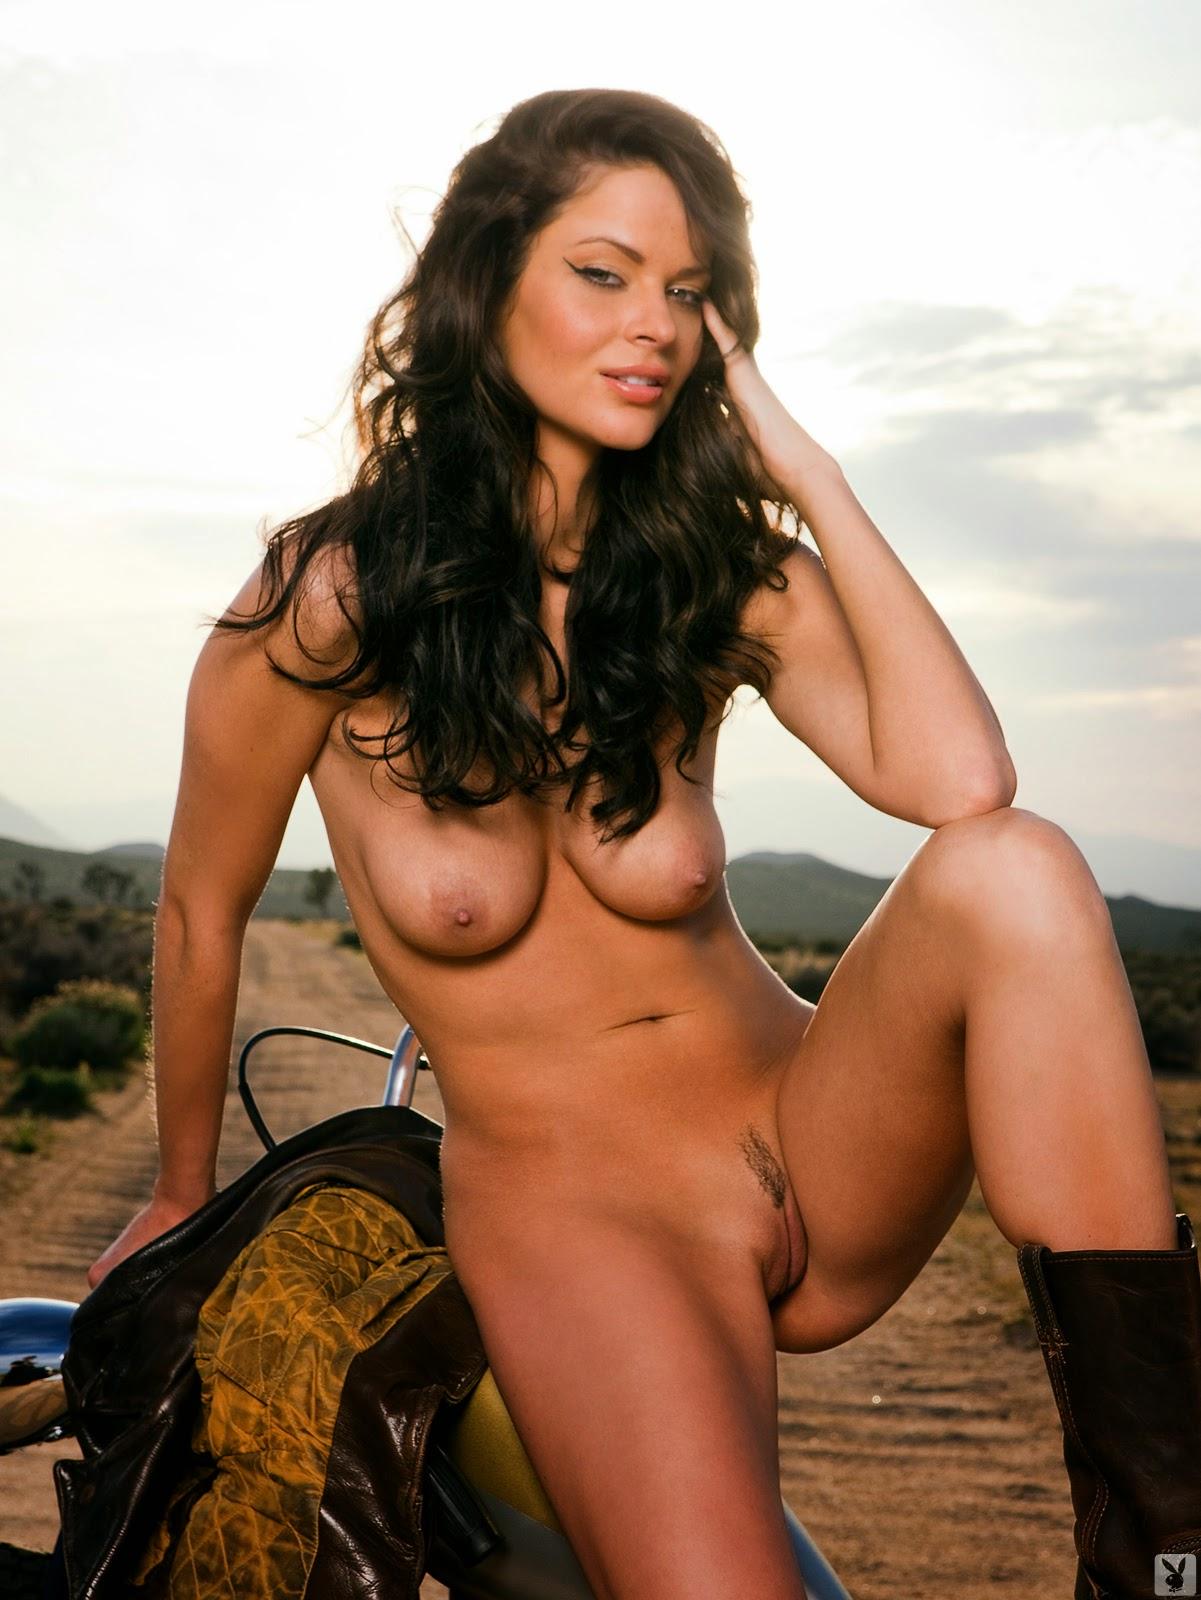 Brooke campos desnudos 10